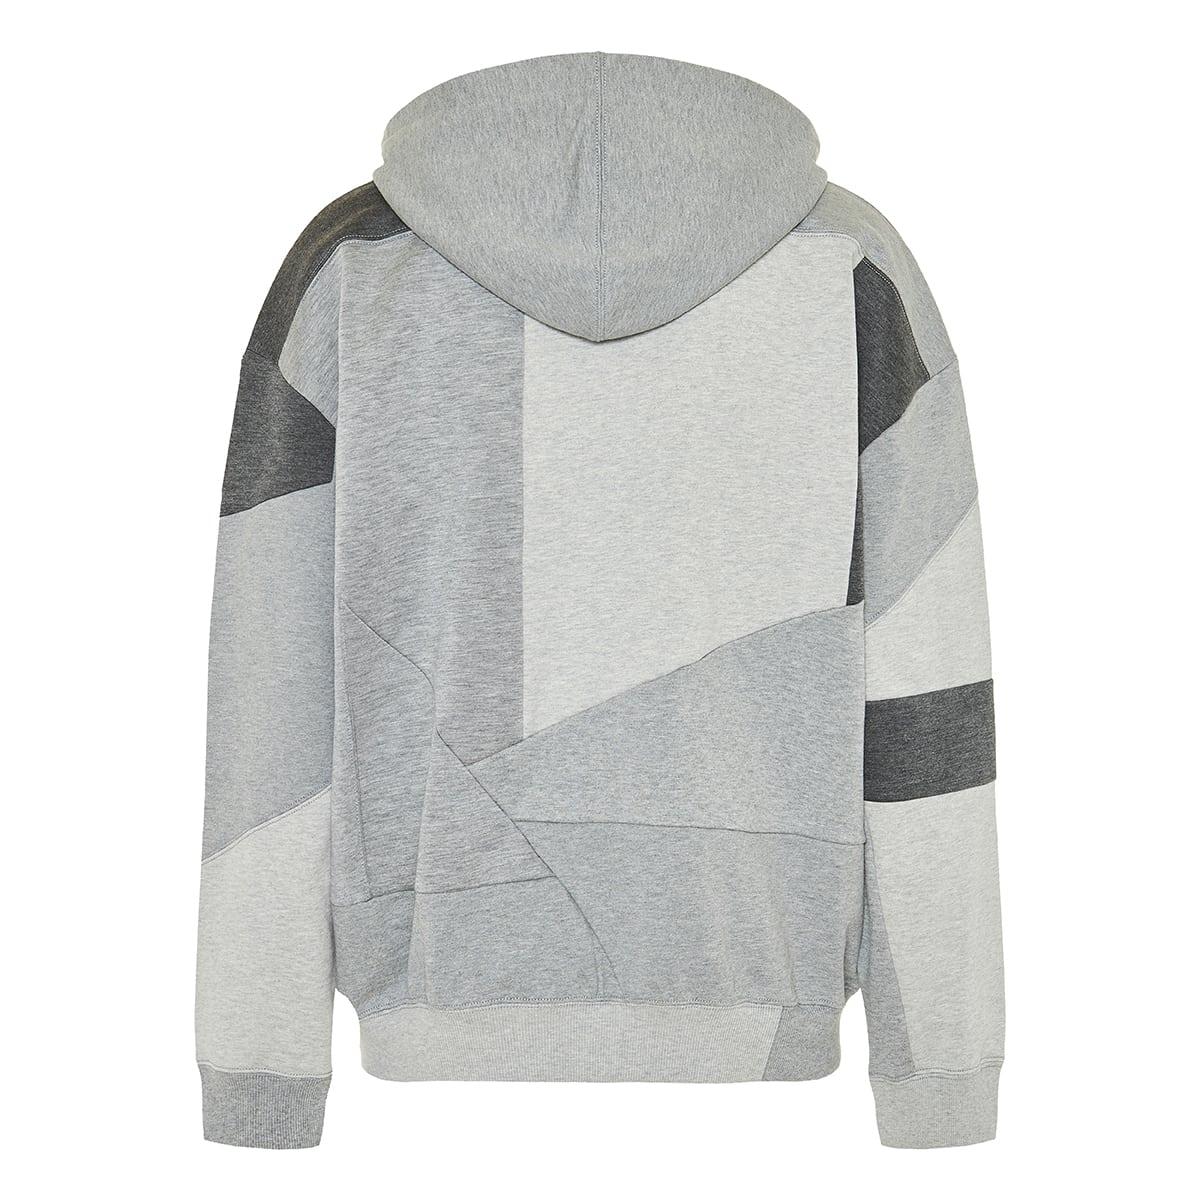 VLTN patchwork zipper hoodie